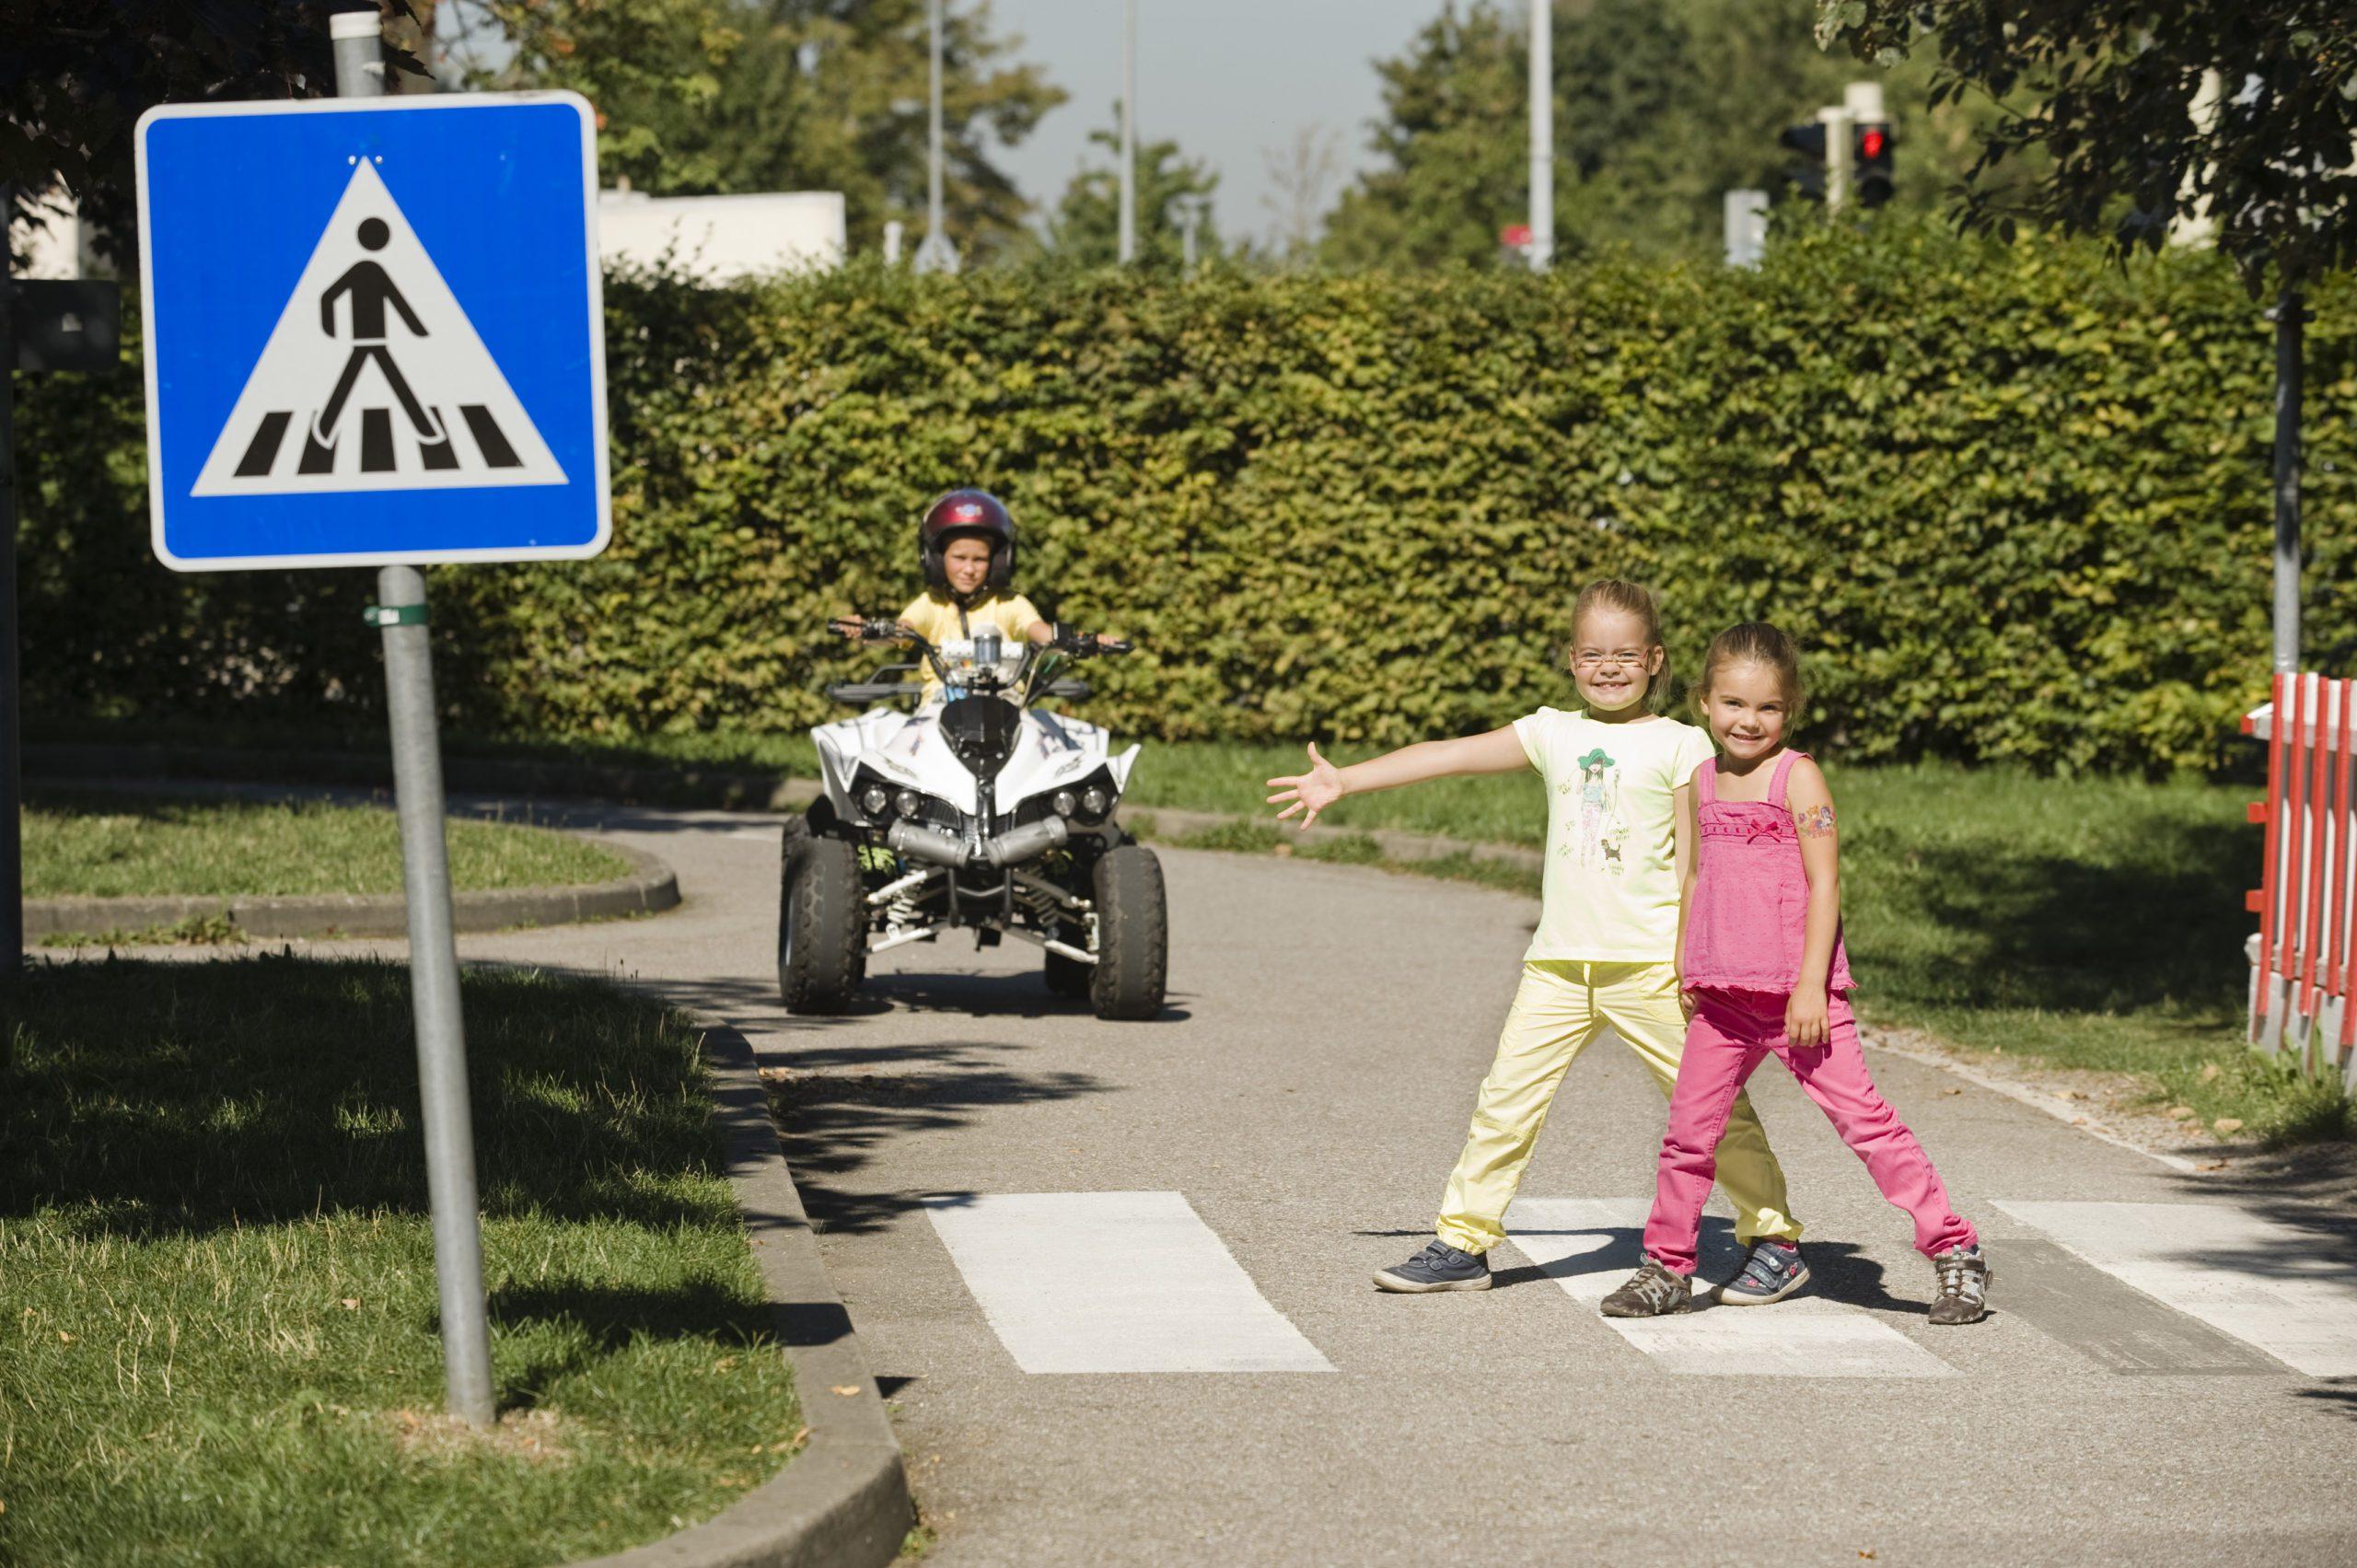 Kiddi-Car Quadfahren kiddicar 0575 scaled